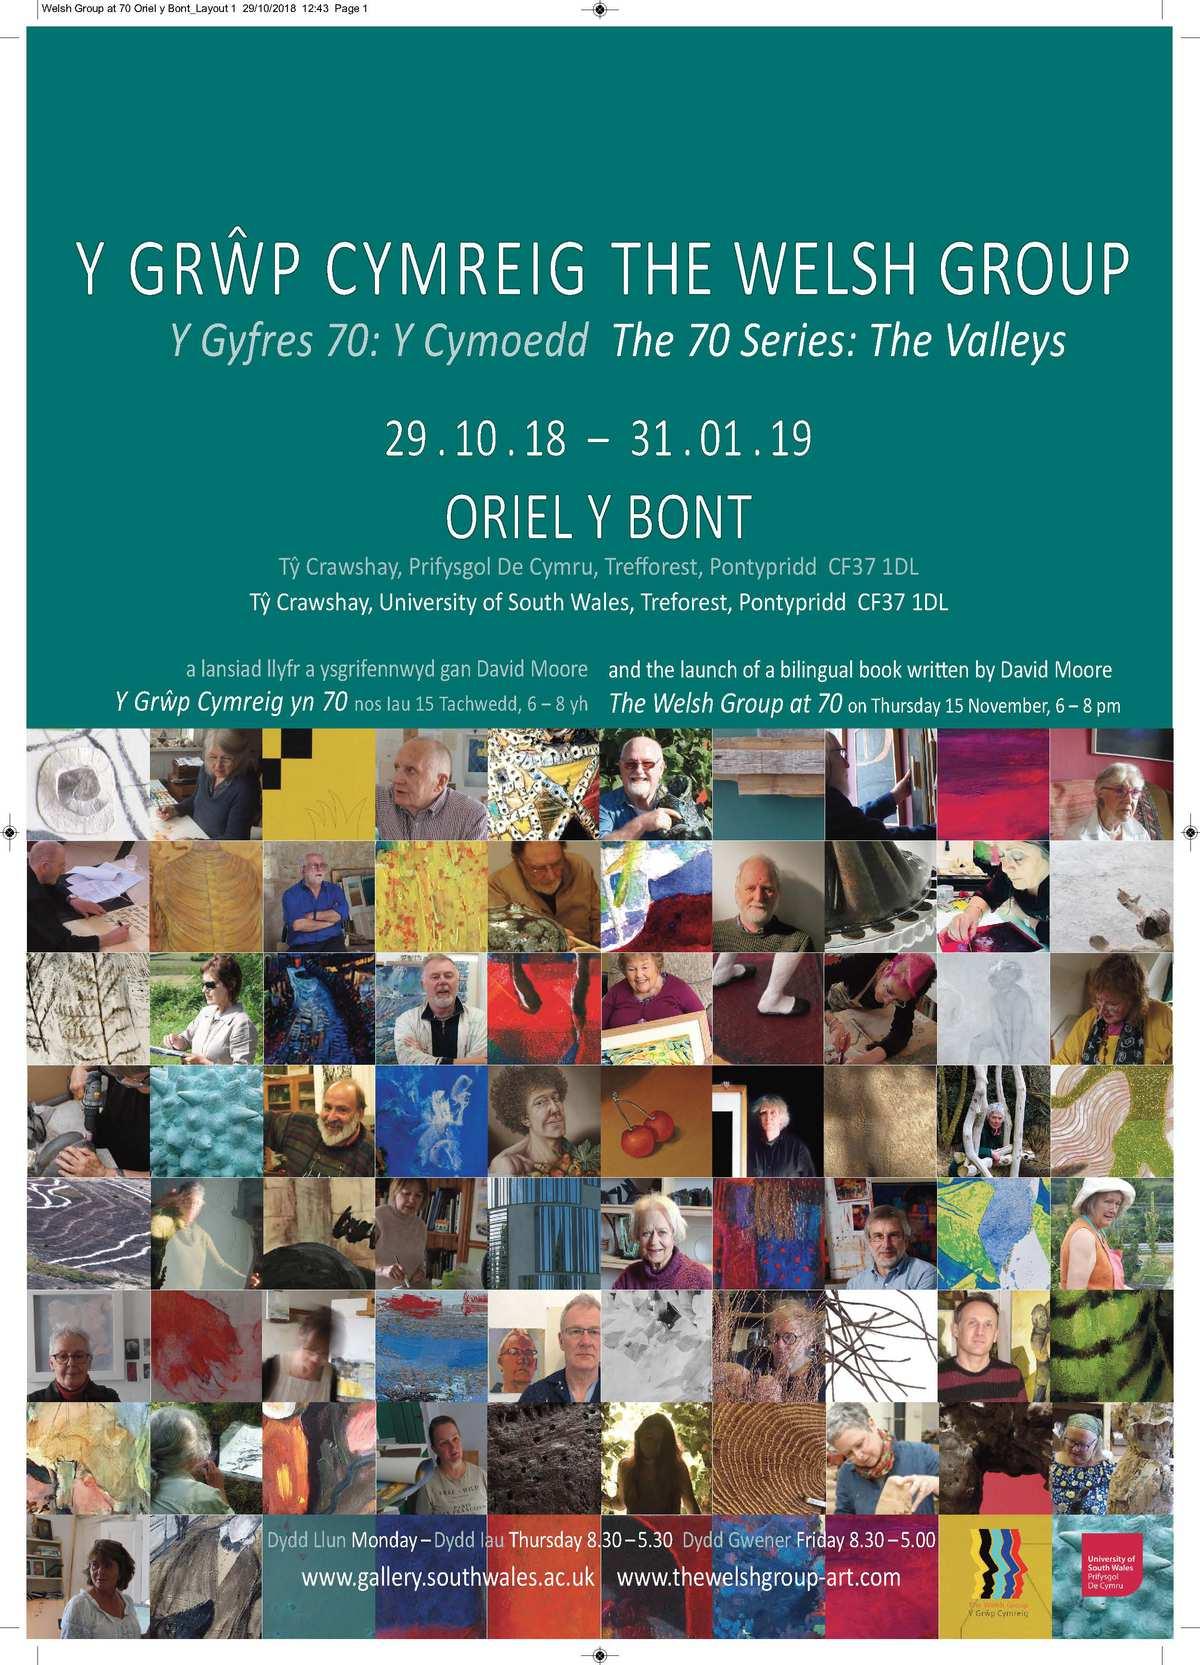 Welsh Group at 70 - Oriel y Bont poster - for printing.jpg